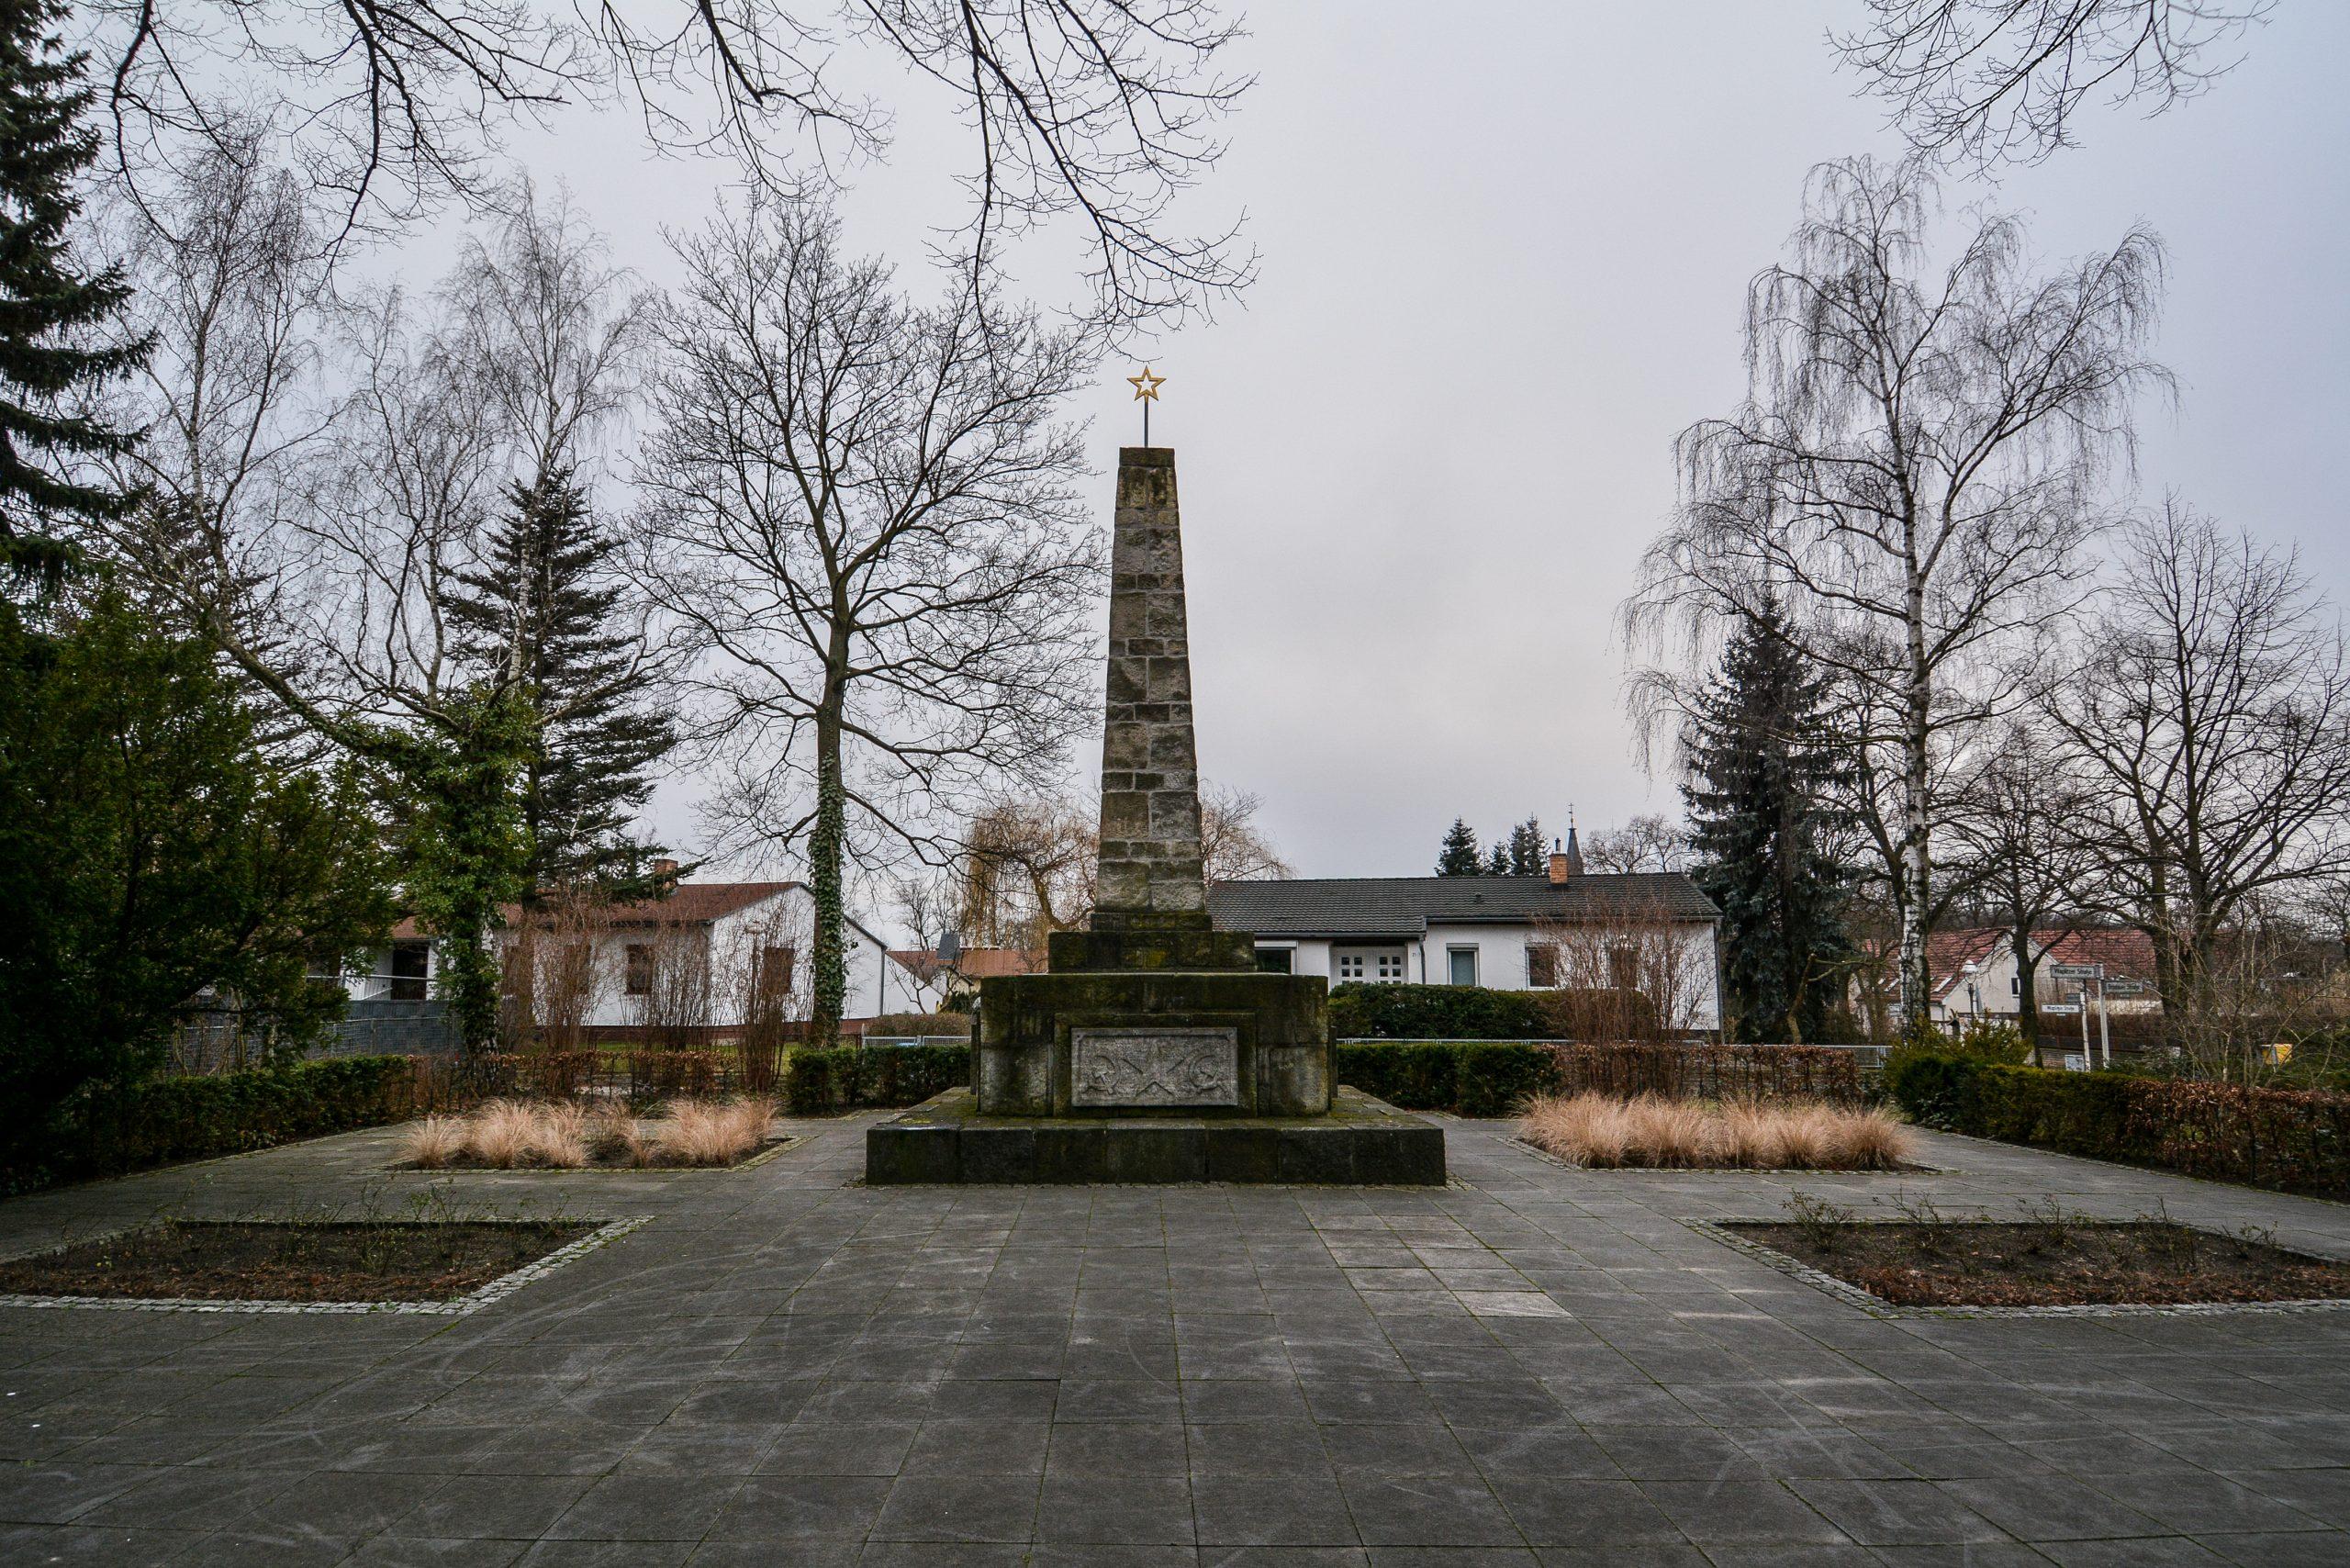 sowjetisches ehrenmal berlin kaulsdorf soviet war memorial berlin kaulsdorf germany deutschland